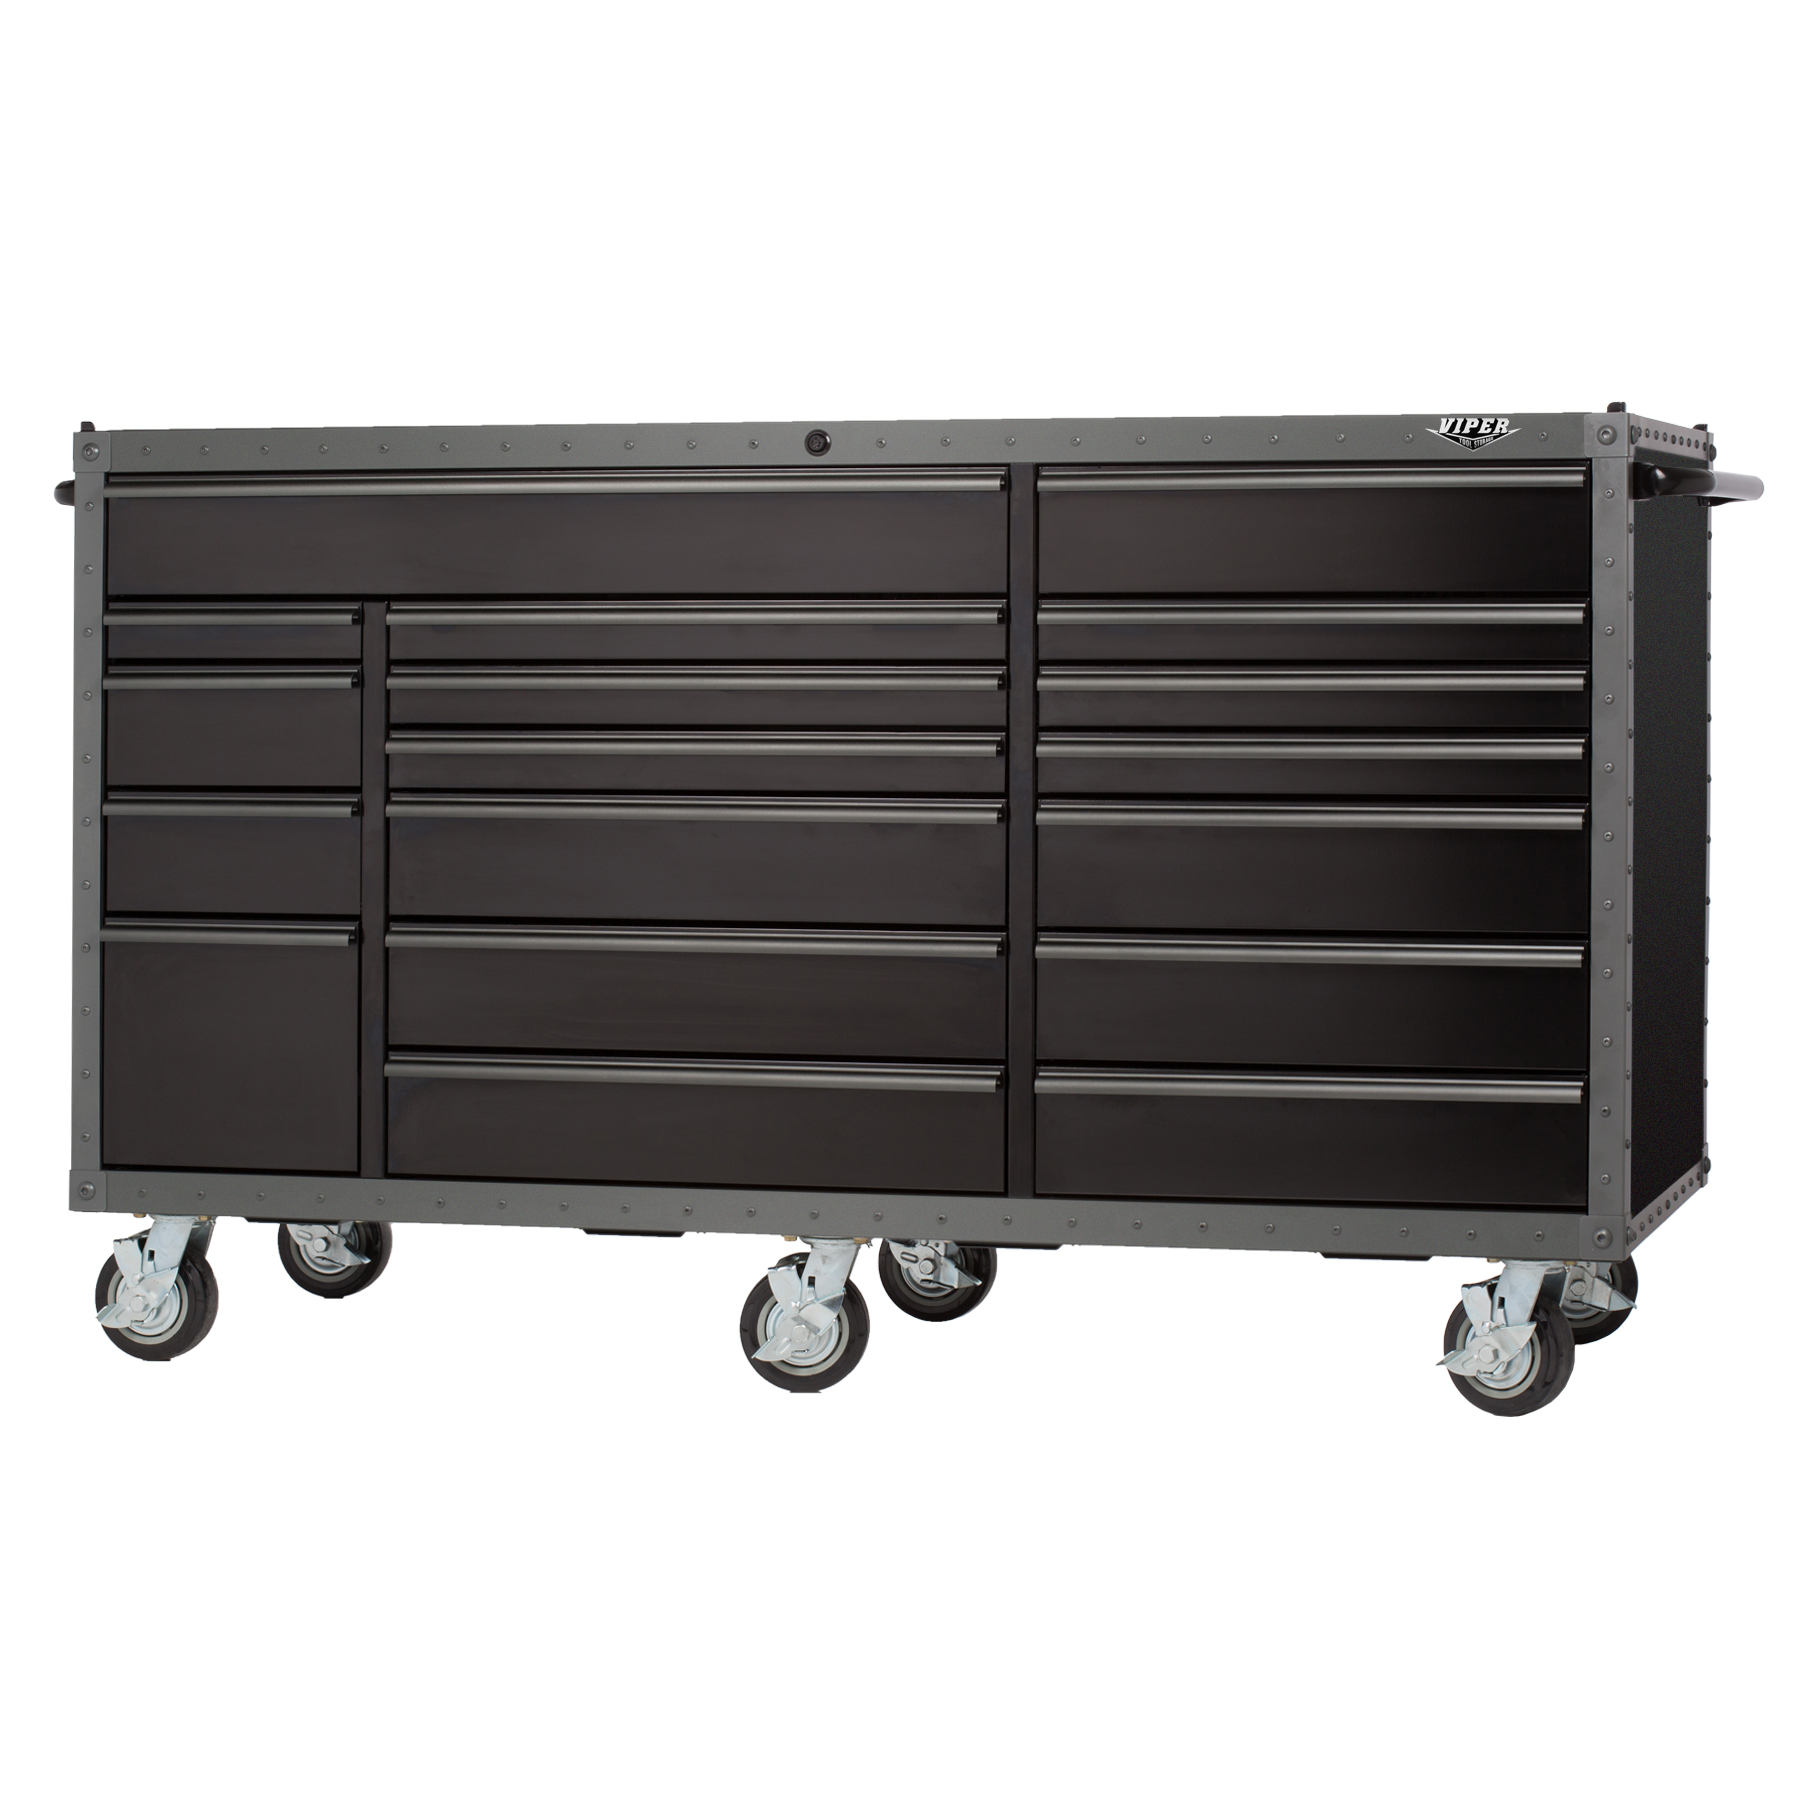 Viper Tool Storage 72-inch ARMOR Series 18 Drawer Series 18G Steel Rolling Cabinet, Black